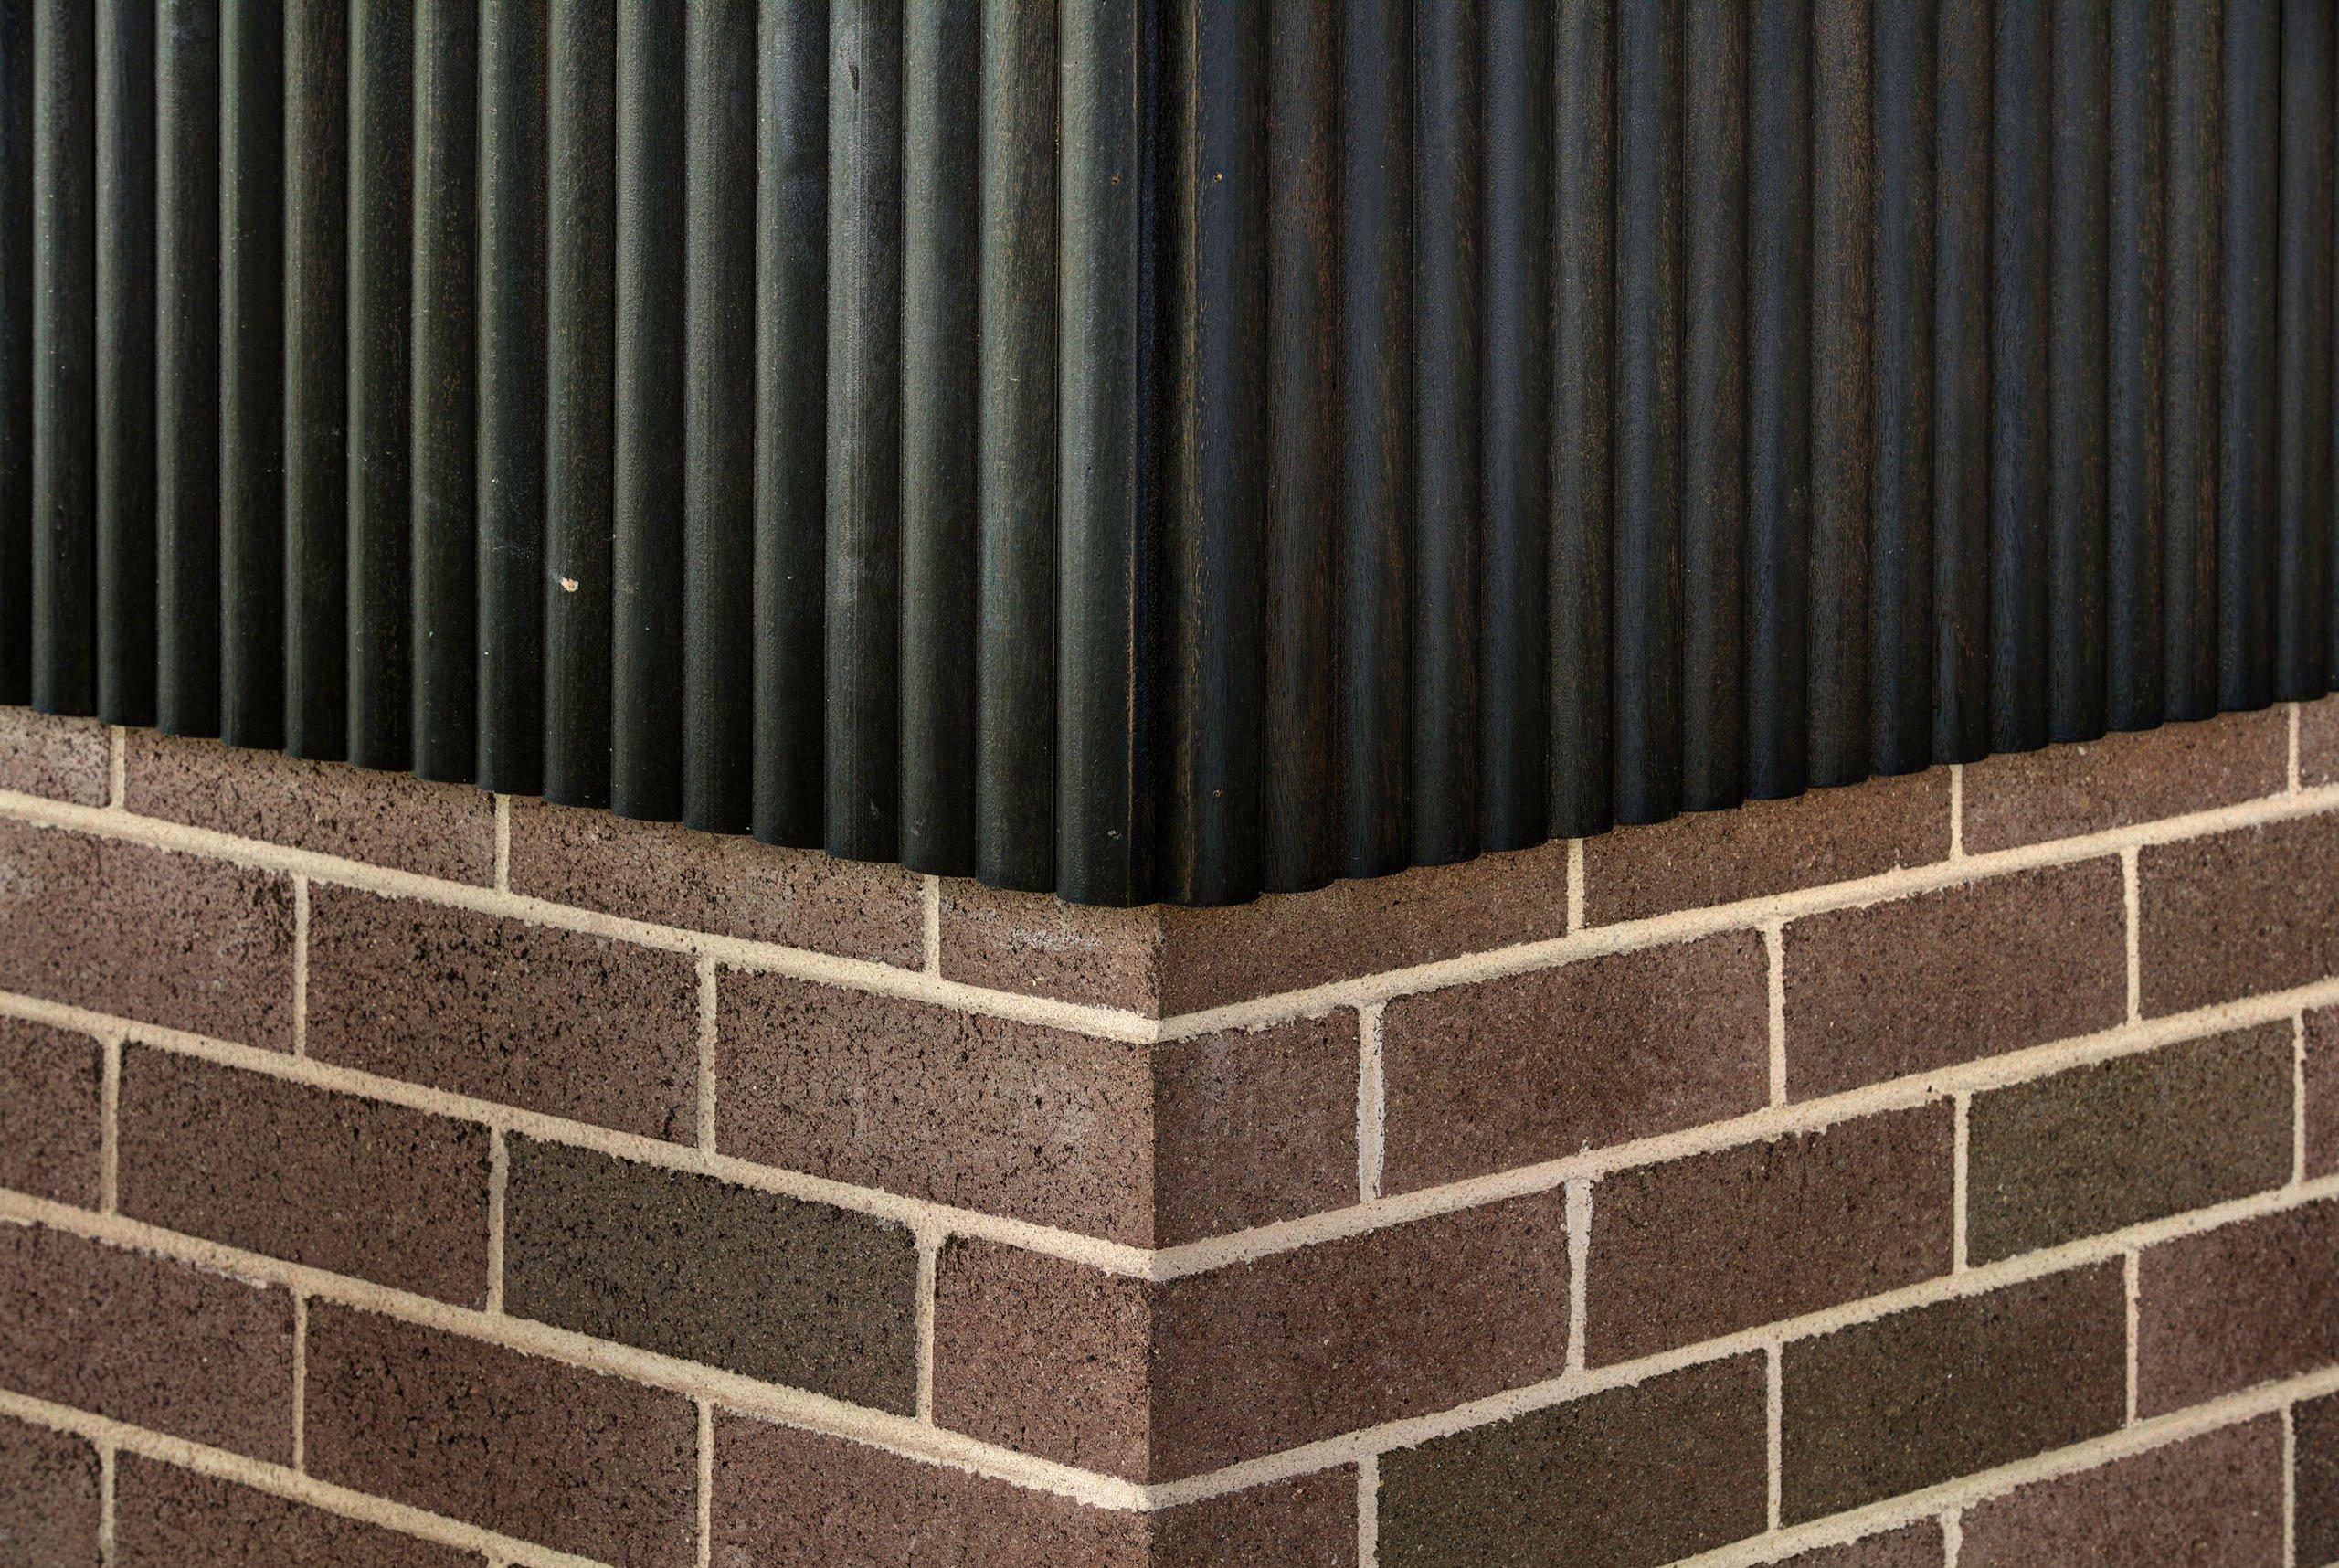 CARTERWILLIAMSON_PHOTO-Brett-Broadman_WoodcroftCommunityCentre_Porta-Endure-Cladding-CloseUp-scaled